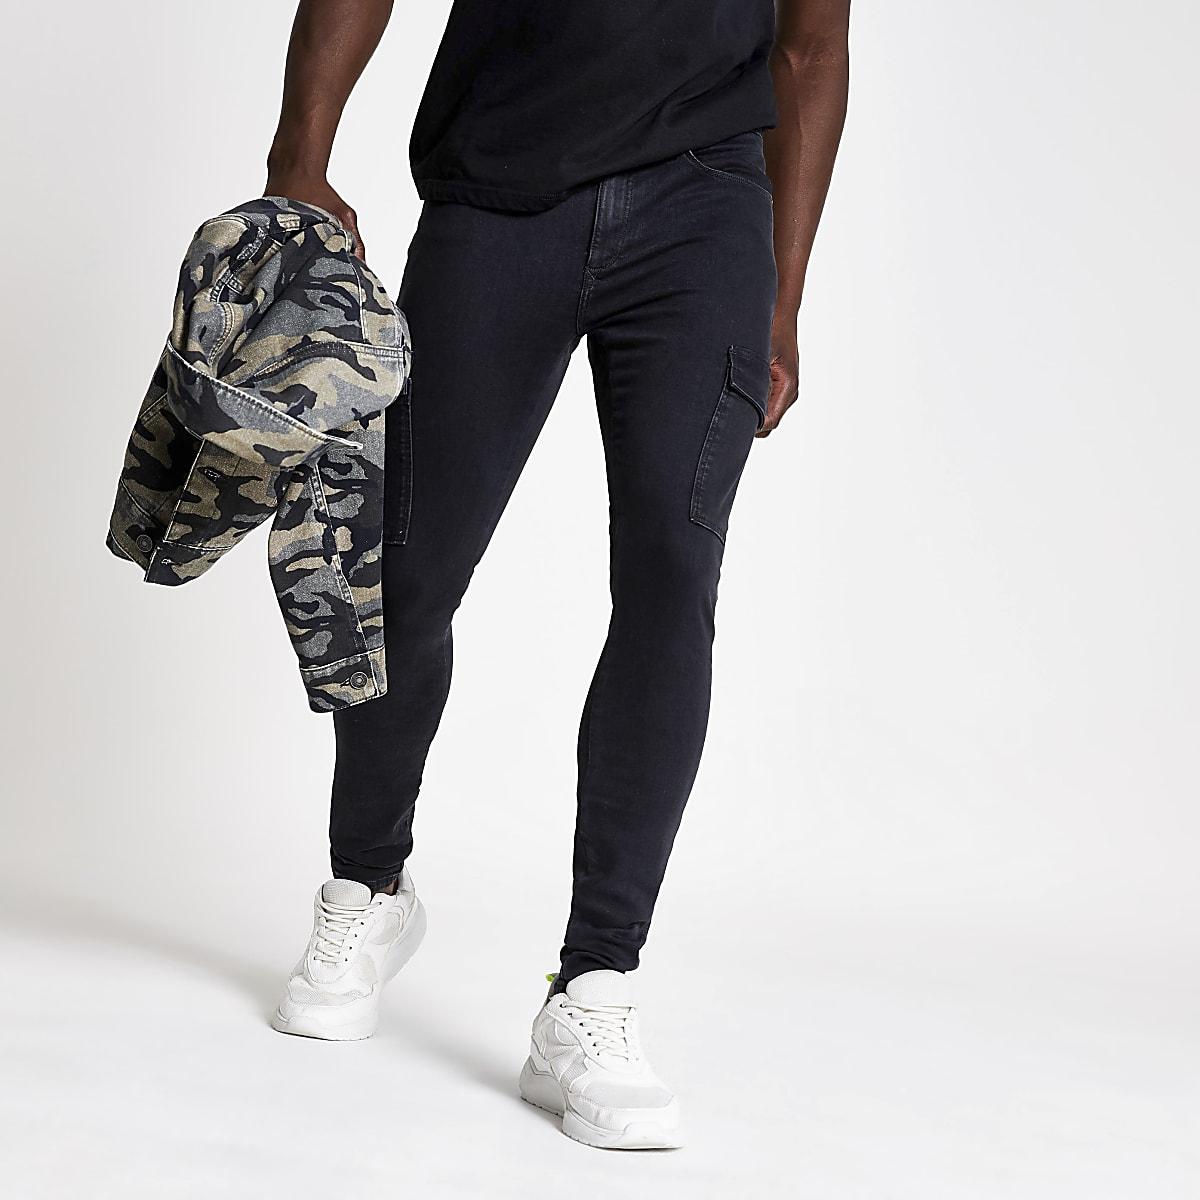 Black Ollie spray on skinny cargo jeans